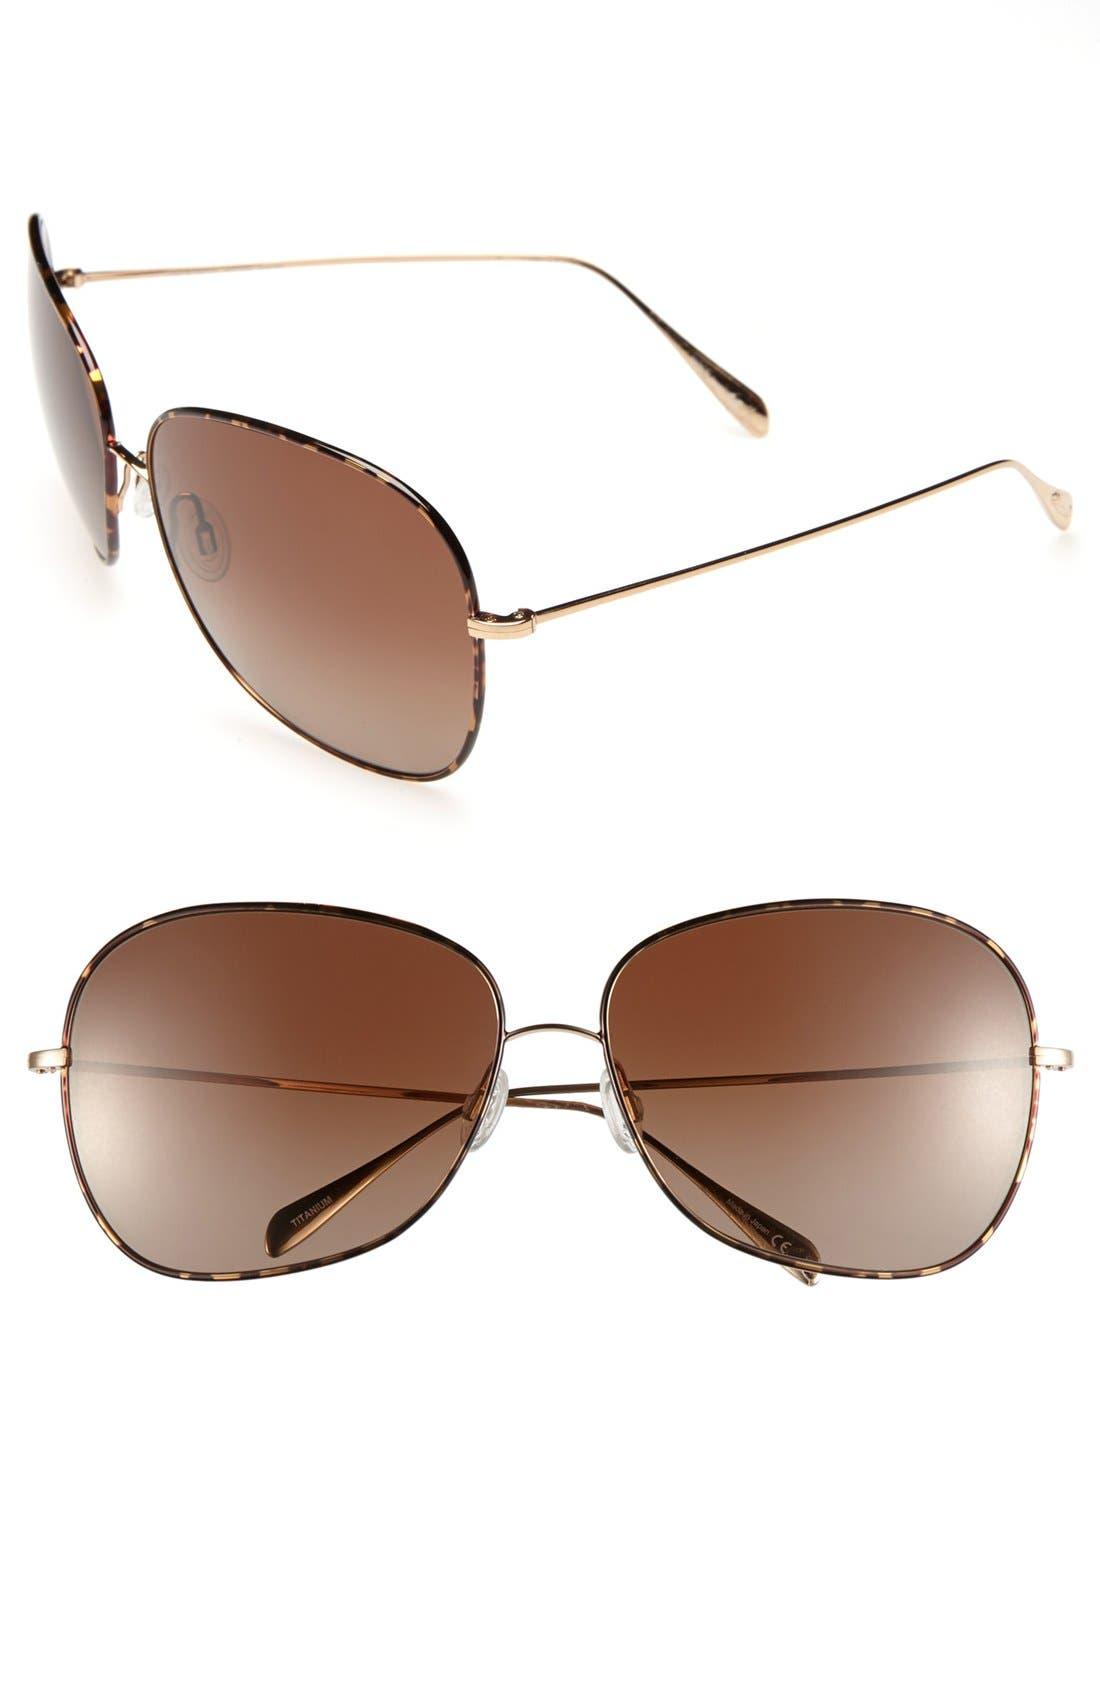 Main Image - Oliver Peoples 'Elsie' 64mm Polarized Sunglasses